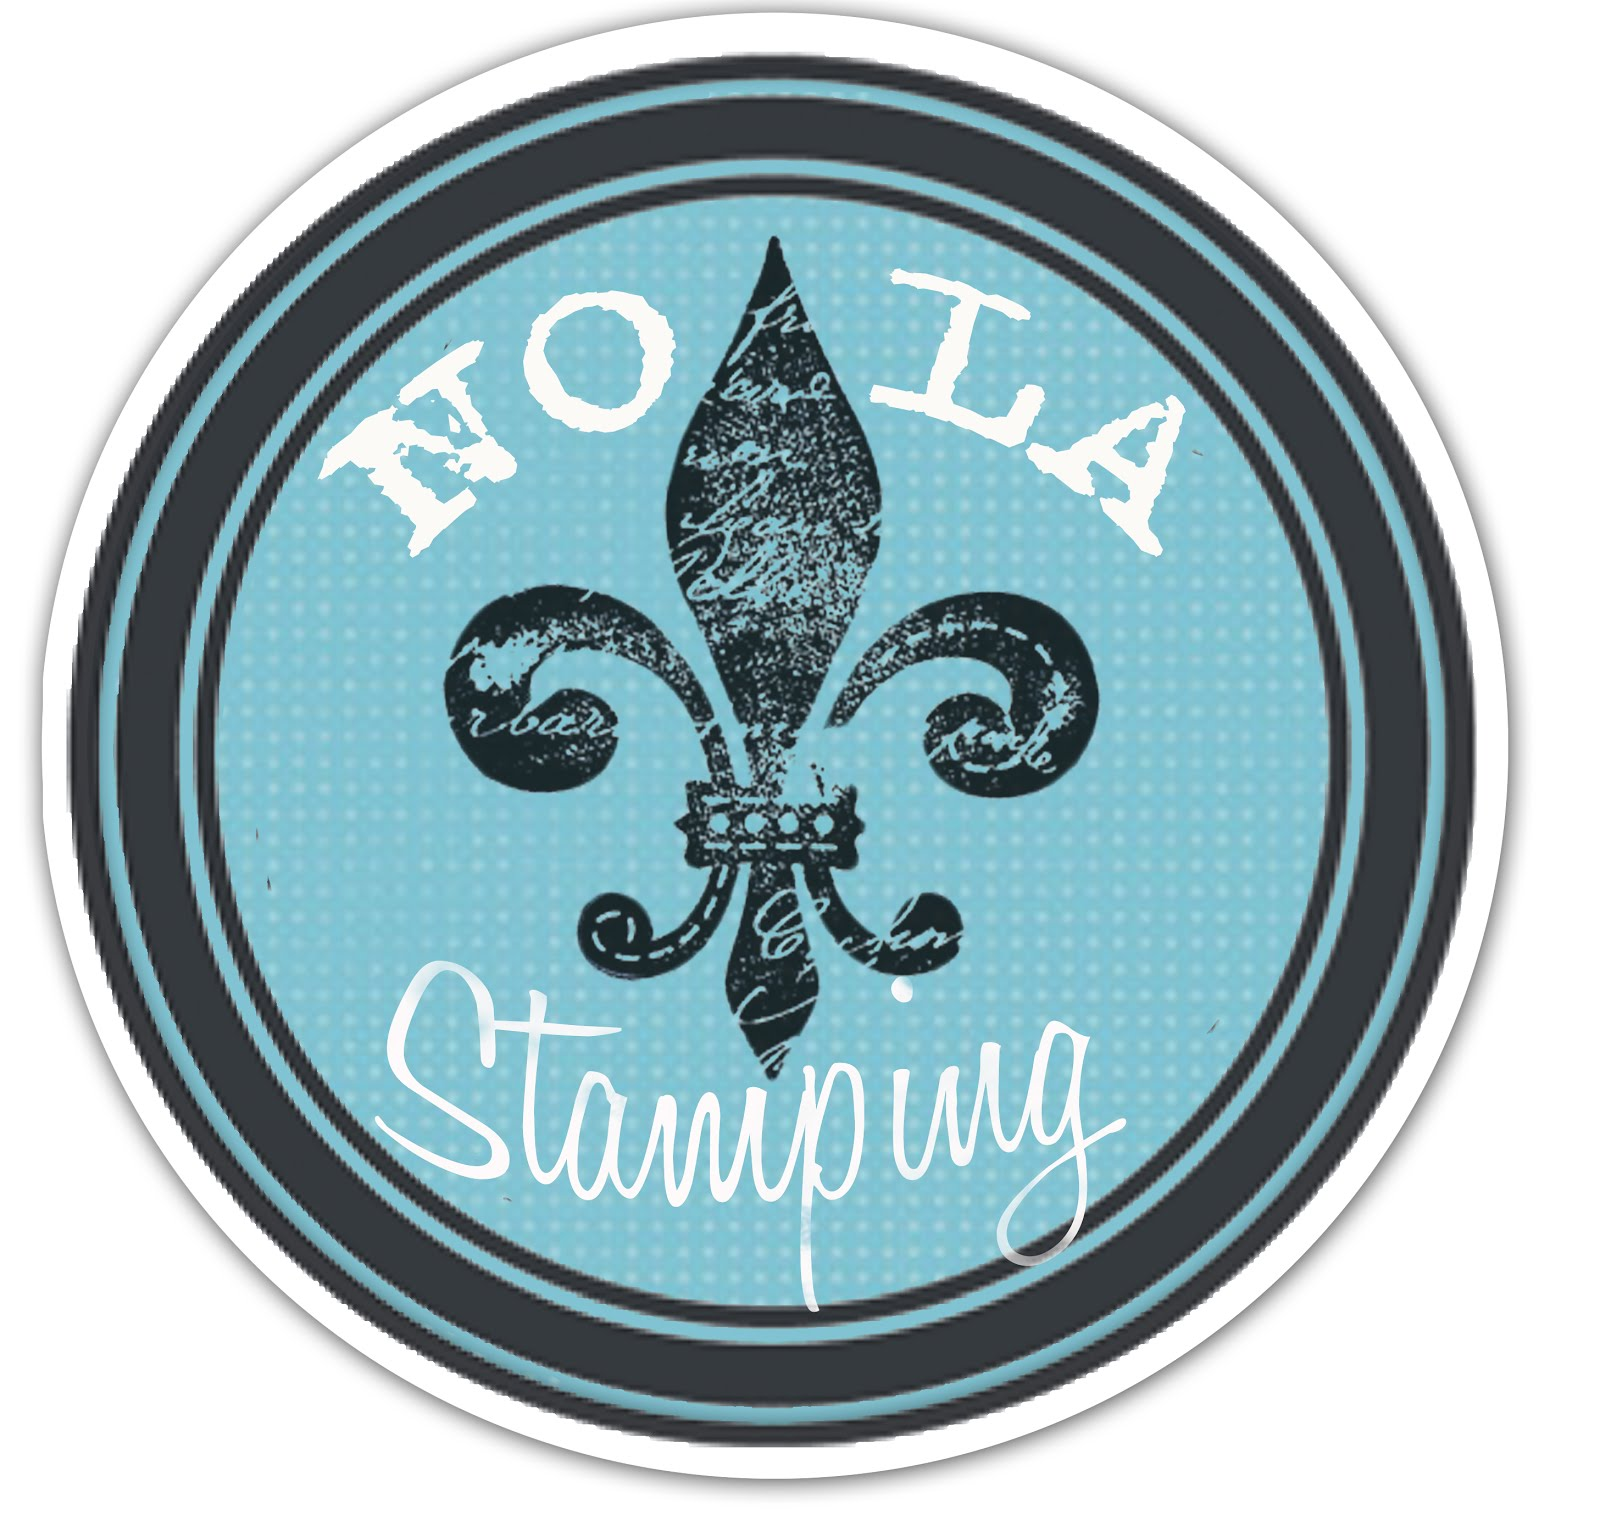 Visit NOLAStamping dot com